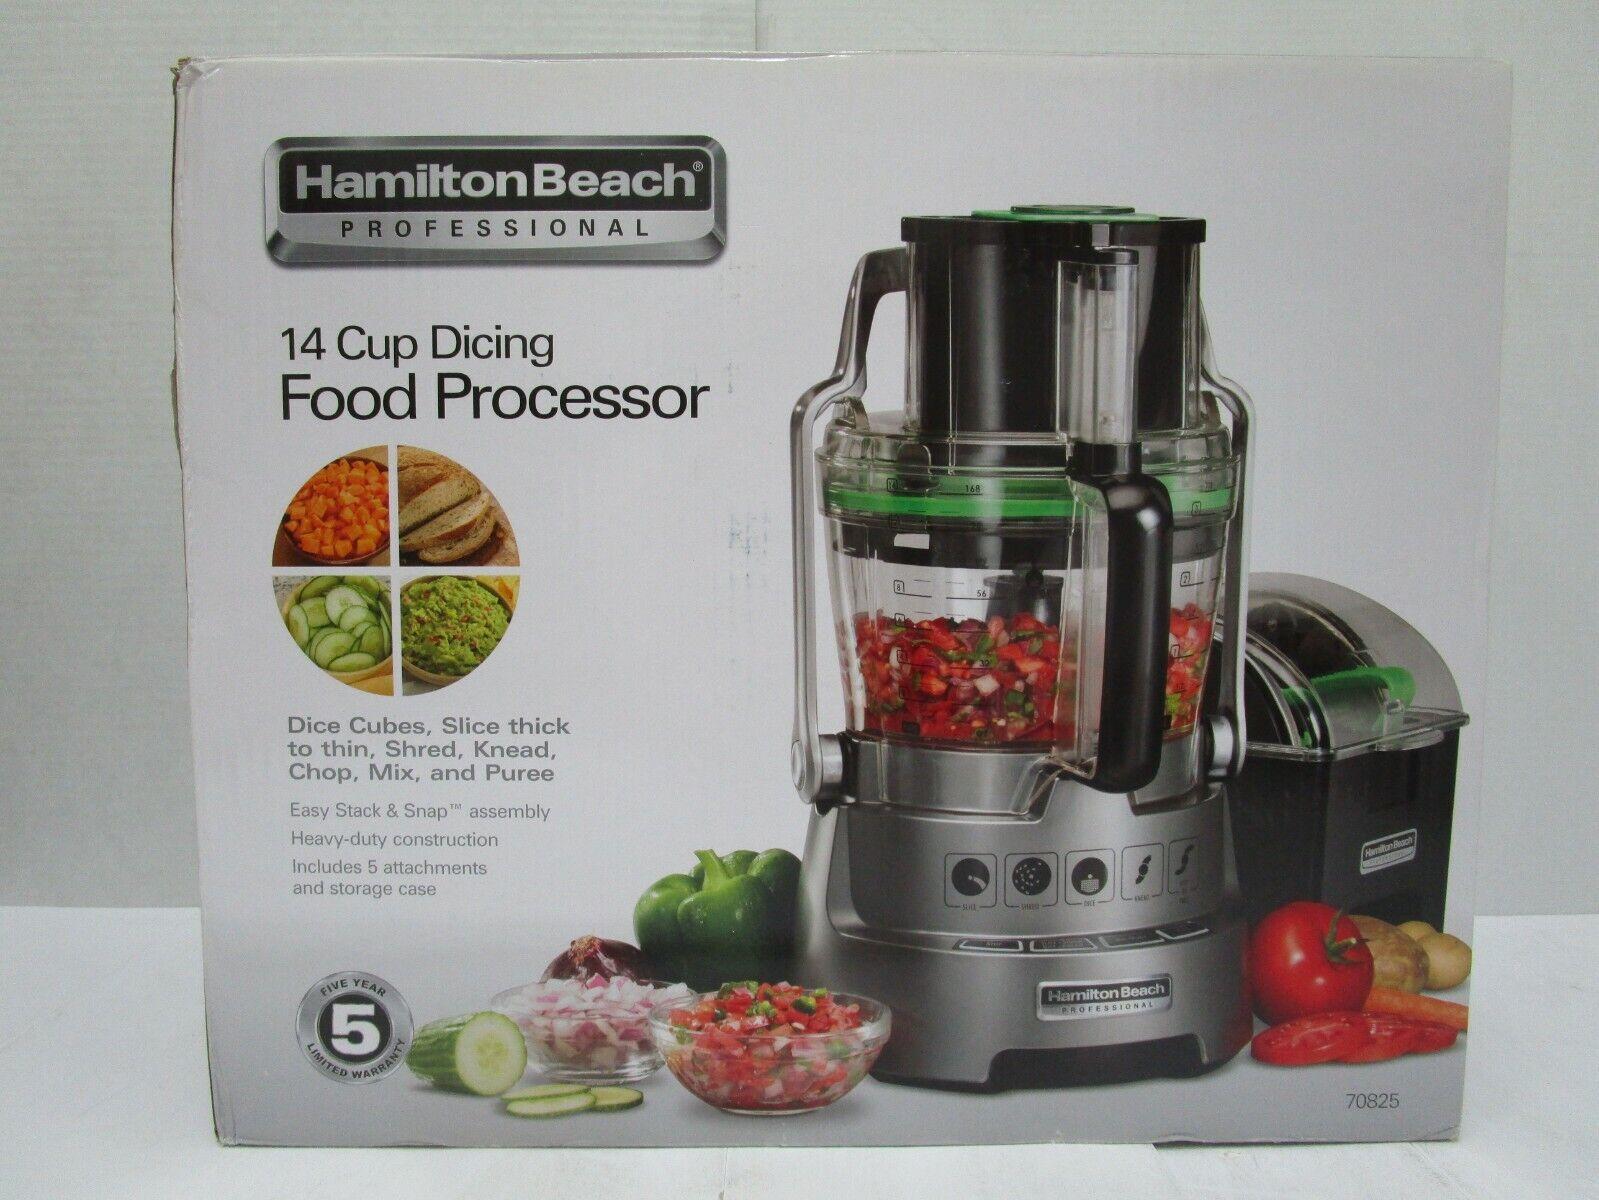 Hamilton Beach - Professional 2-speed Food Processor - Gray